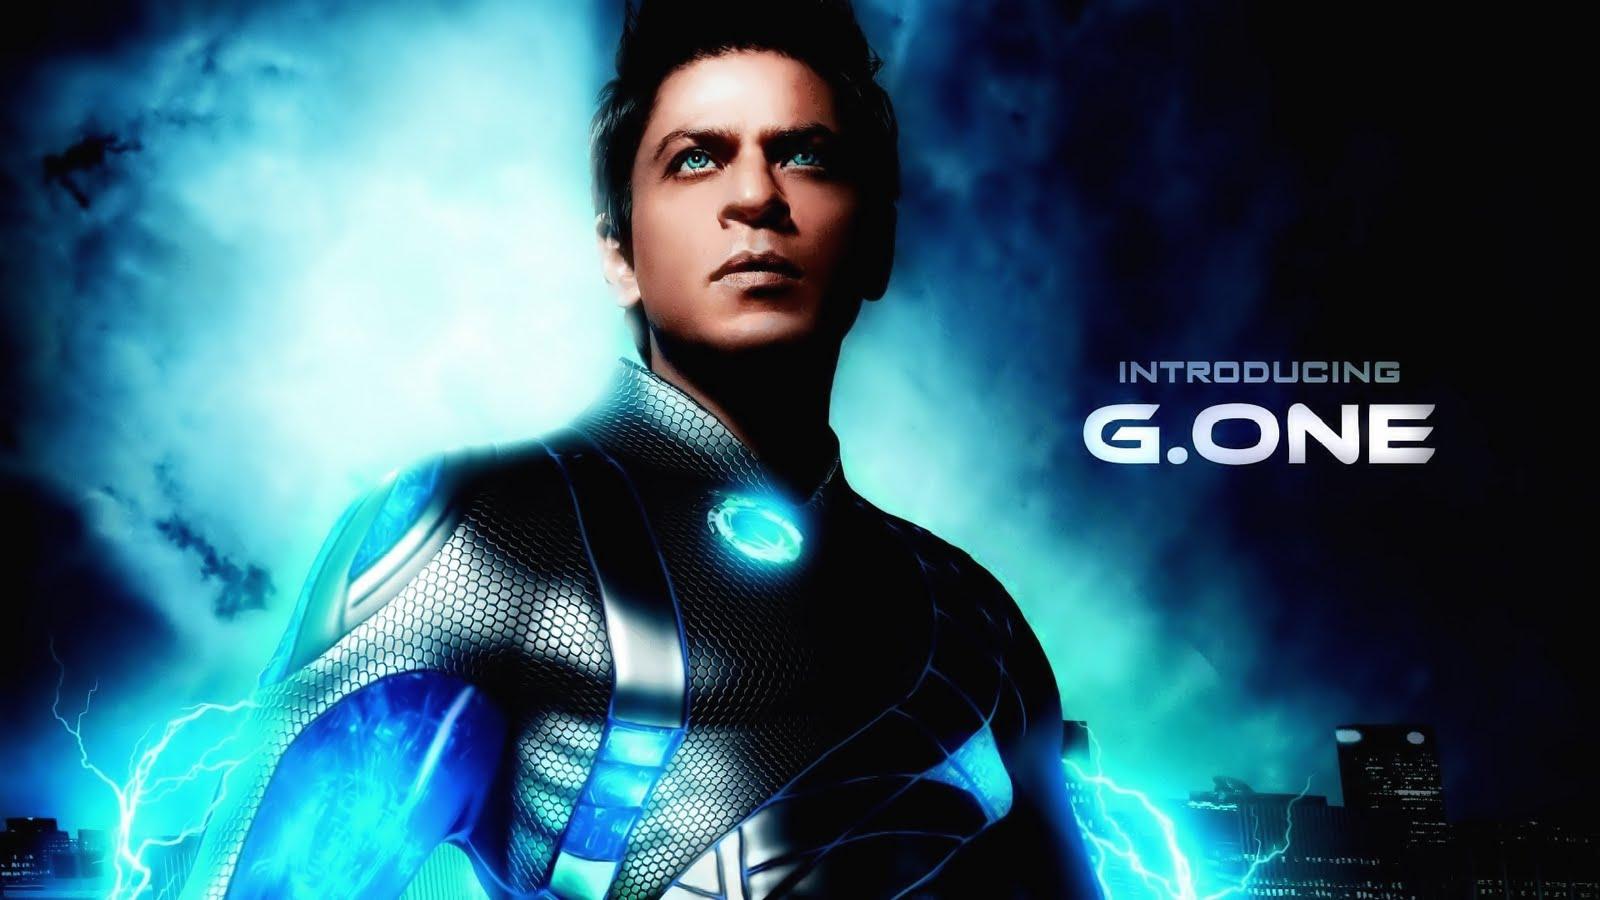 Shahrukh khan .Ra One movie HD wallapapers size 1920x1080